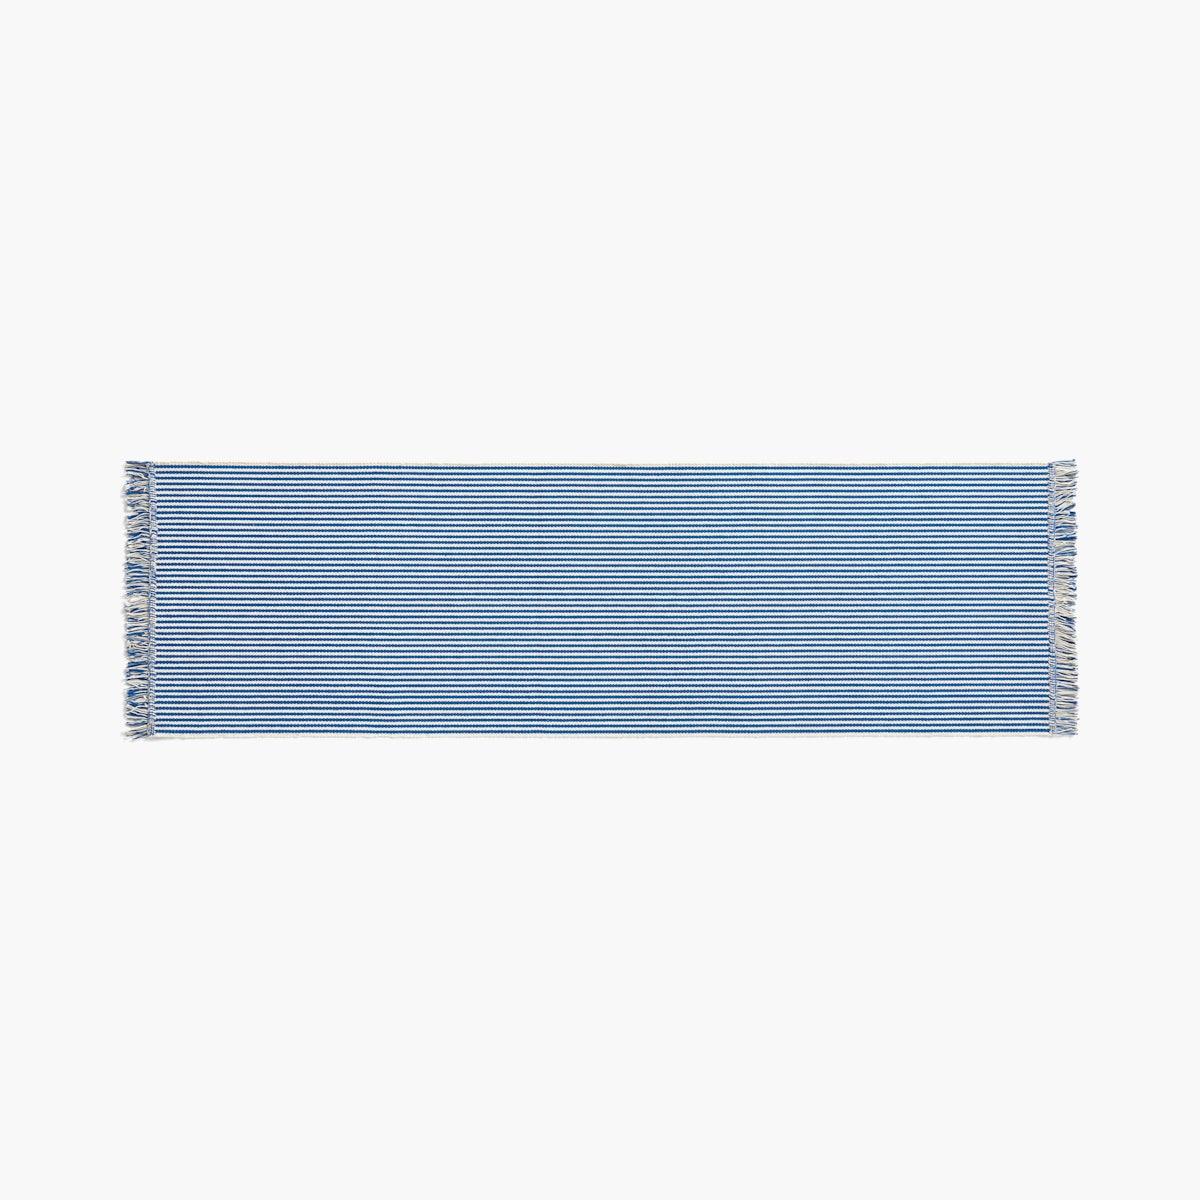 Stripes and Stripes Rug